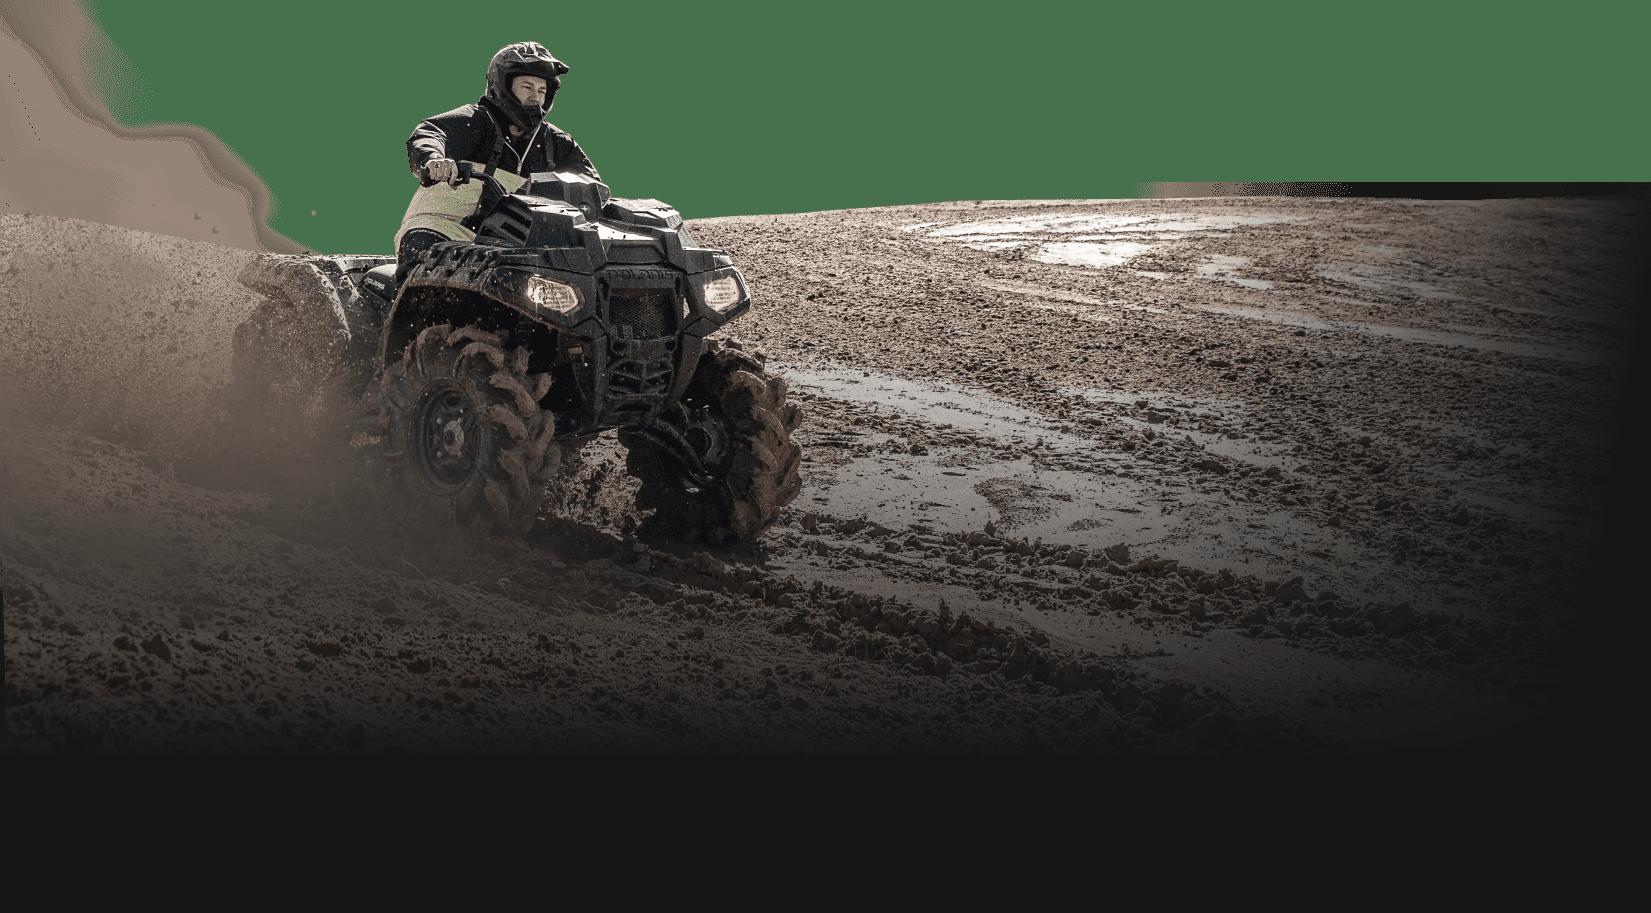 Man riding ATV in the mud